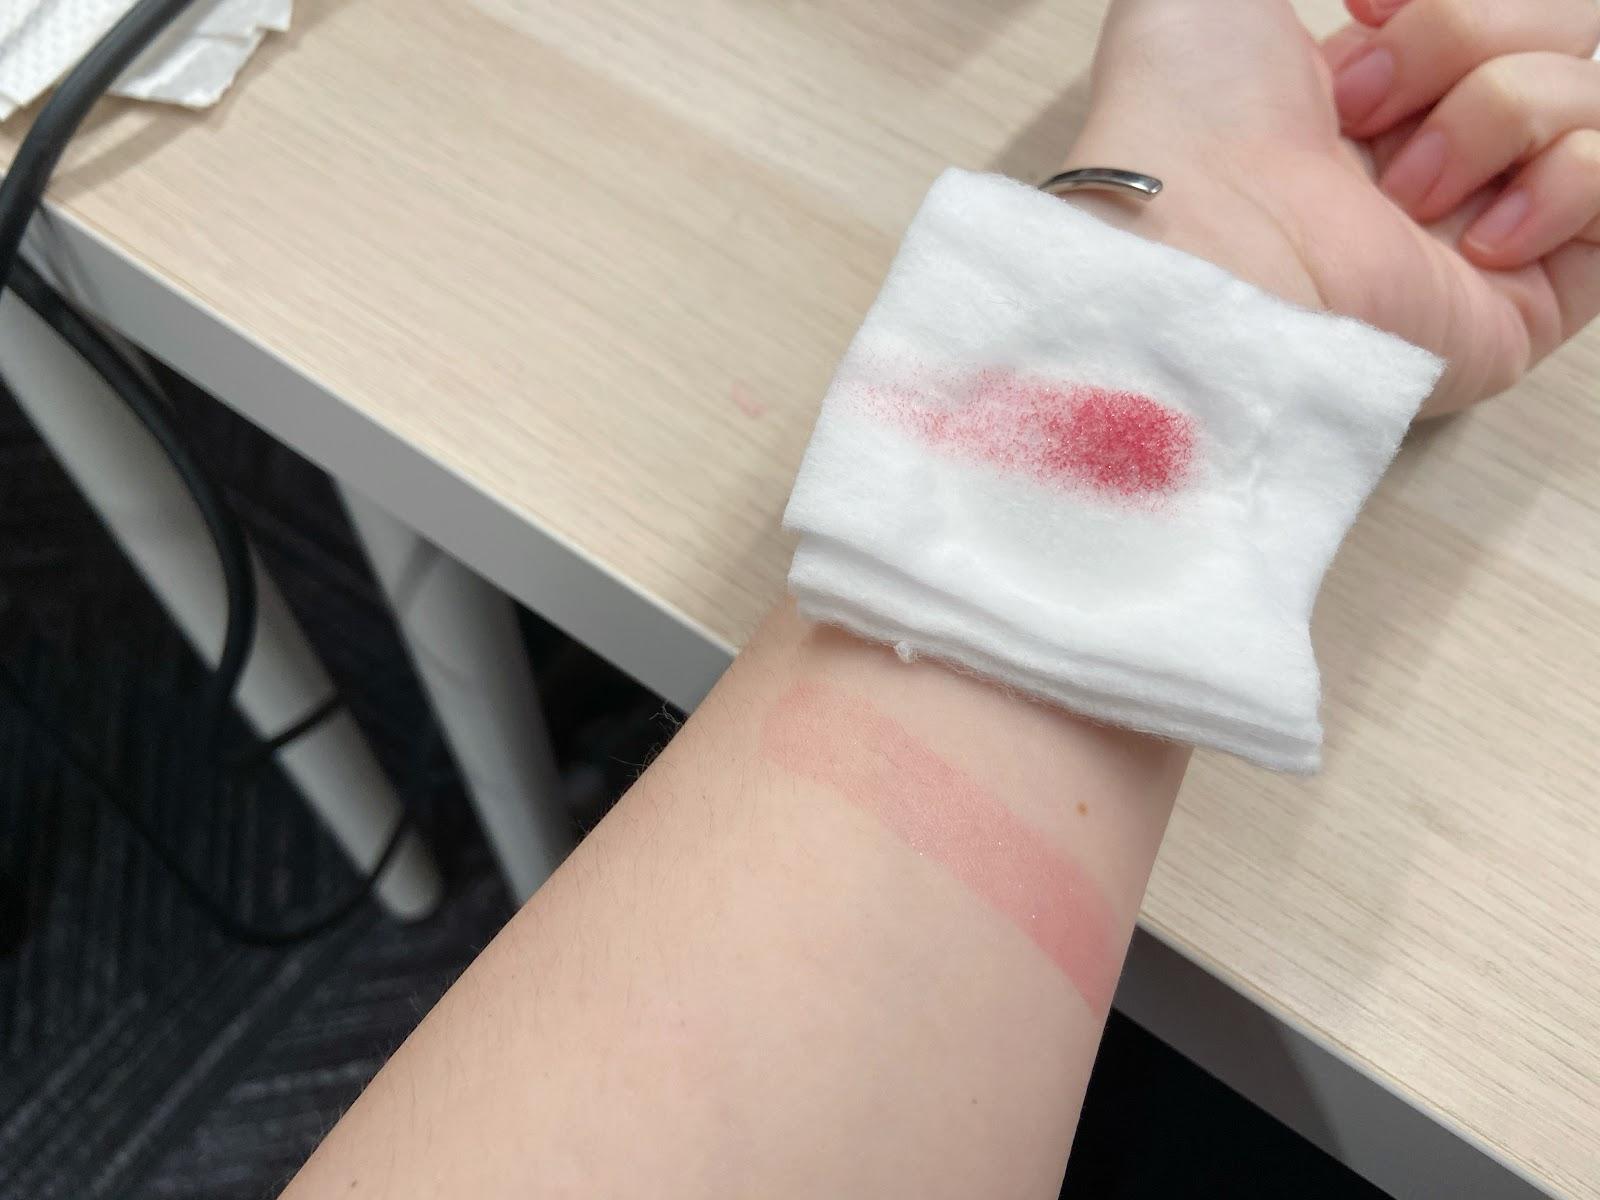 Dior 星星唇膏 迪奧 Addict Stellar Halo Shine lipstick 578 推薦